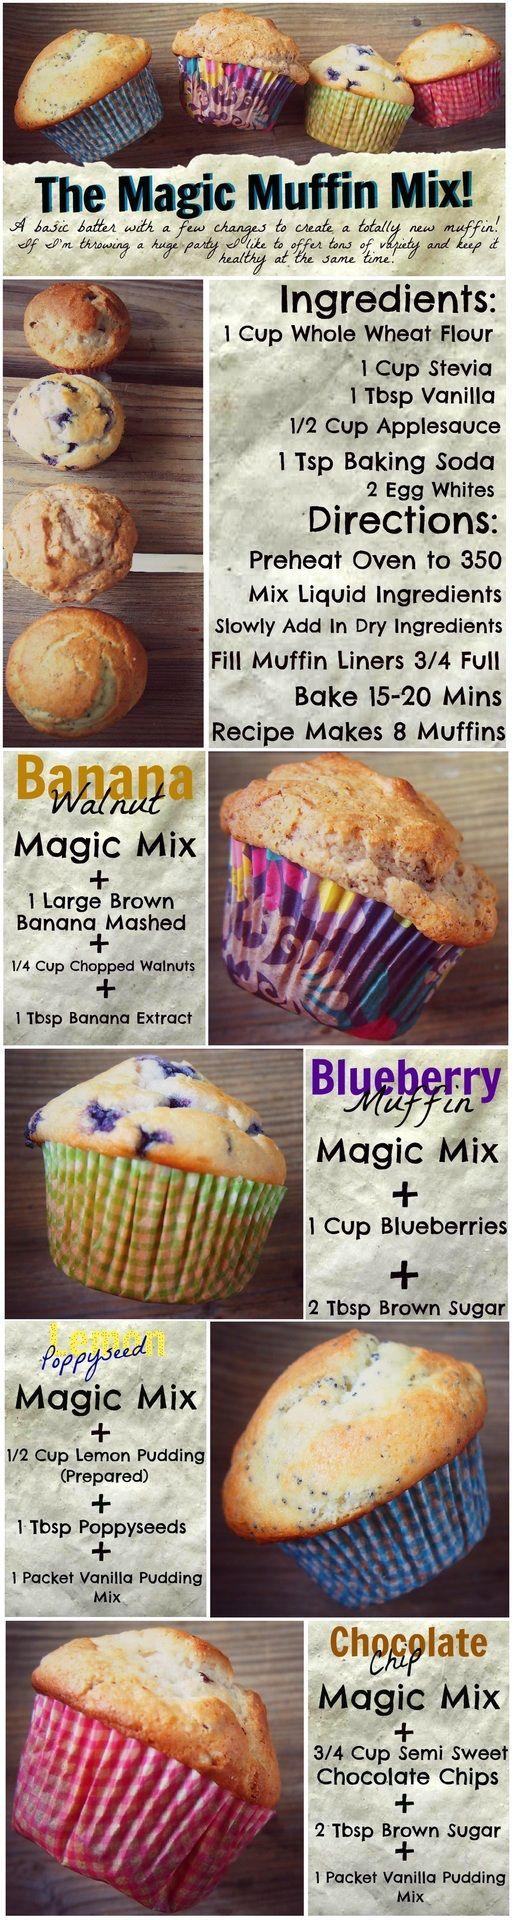 Add 2tbsp of Greek yogurt, 2 tbsp of canola oil, 1/2 cup splenda, 1cup wheat flour and 1/2cup of white flour.